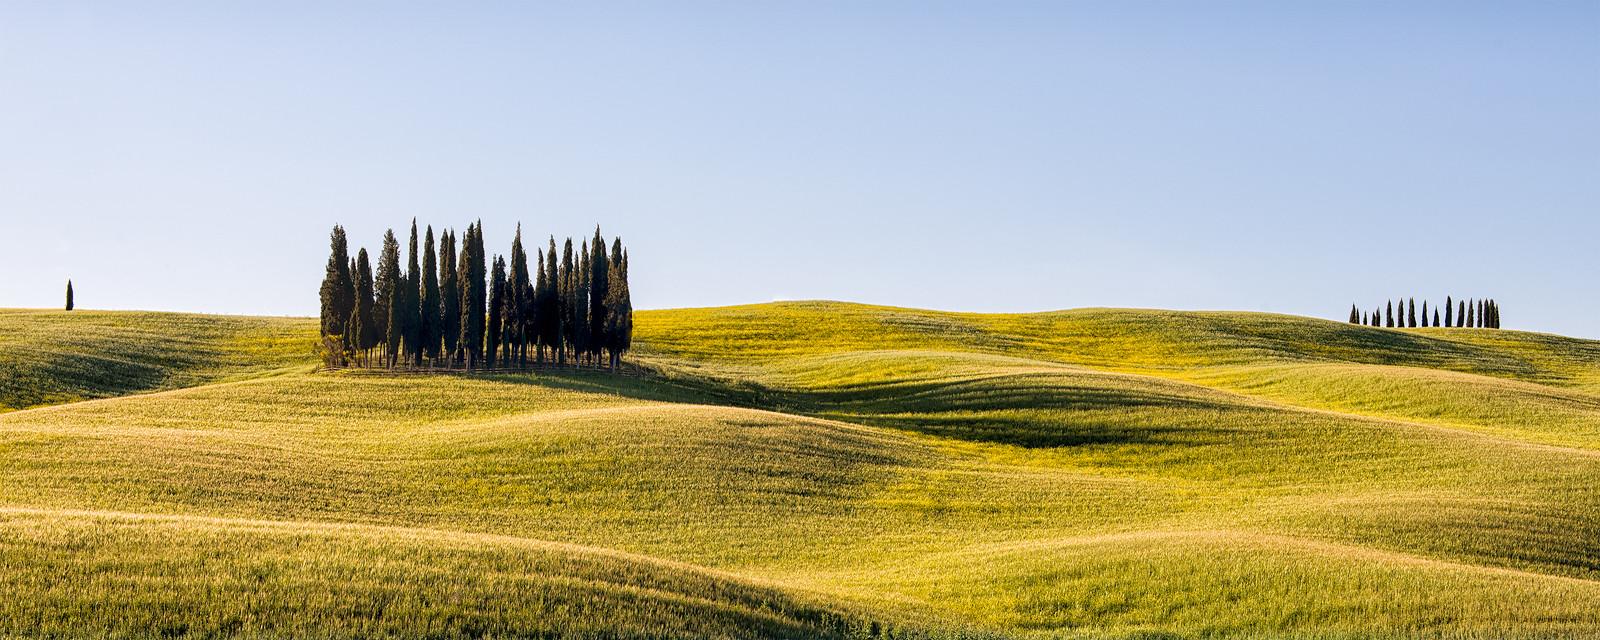 PDI - A Tuscan Landscape by Pauline O'Flaherty (9 marks)